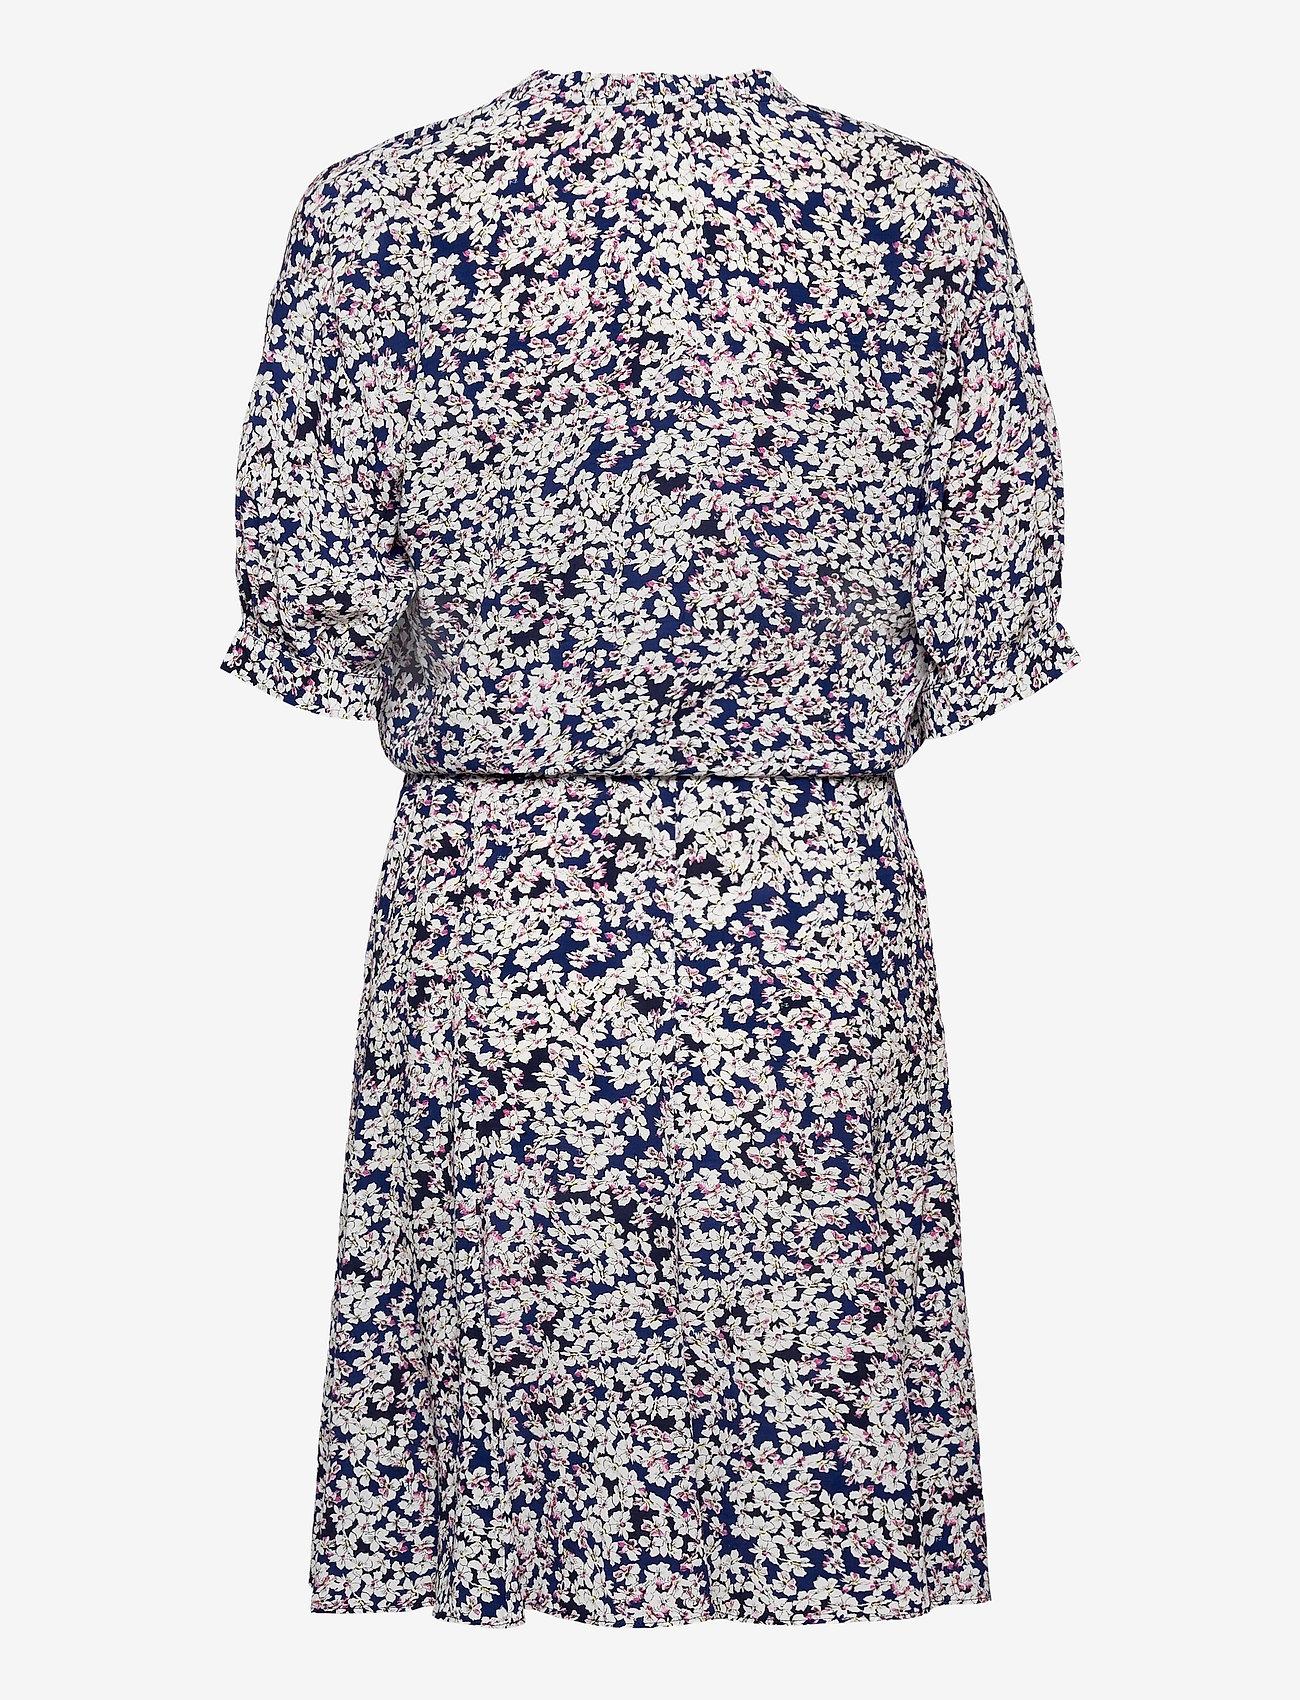 Zadig & Voltaire - REMOVE CDC PRINT BEGONIA DRESS - sommerkjoler - bleu de chine - 2